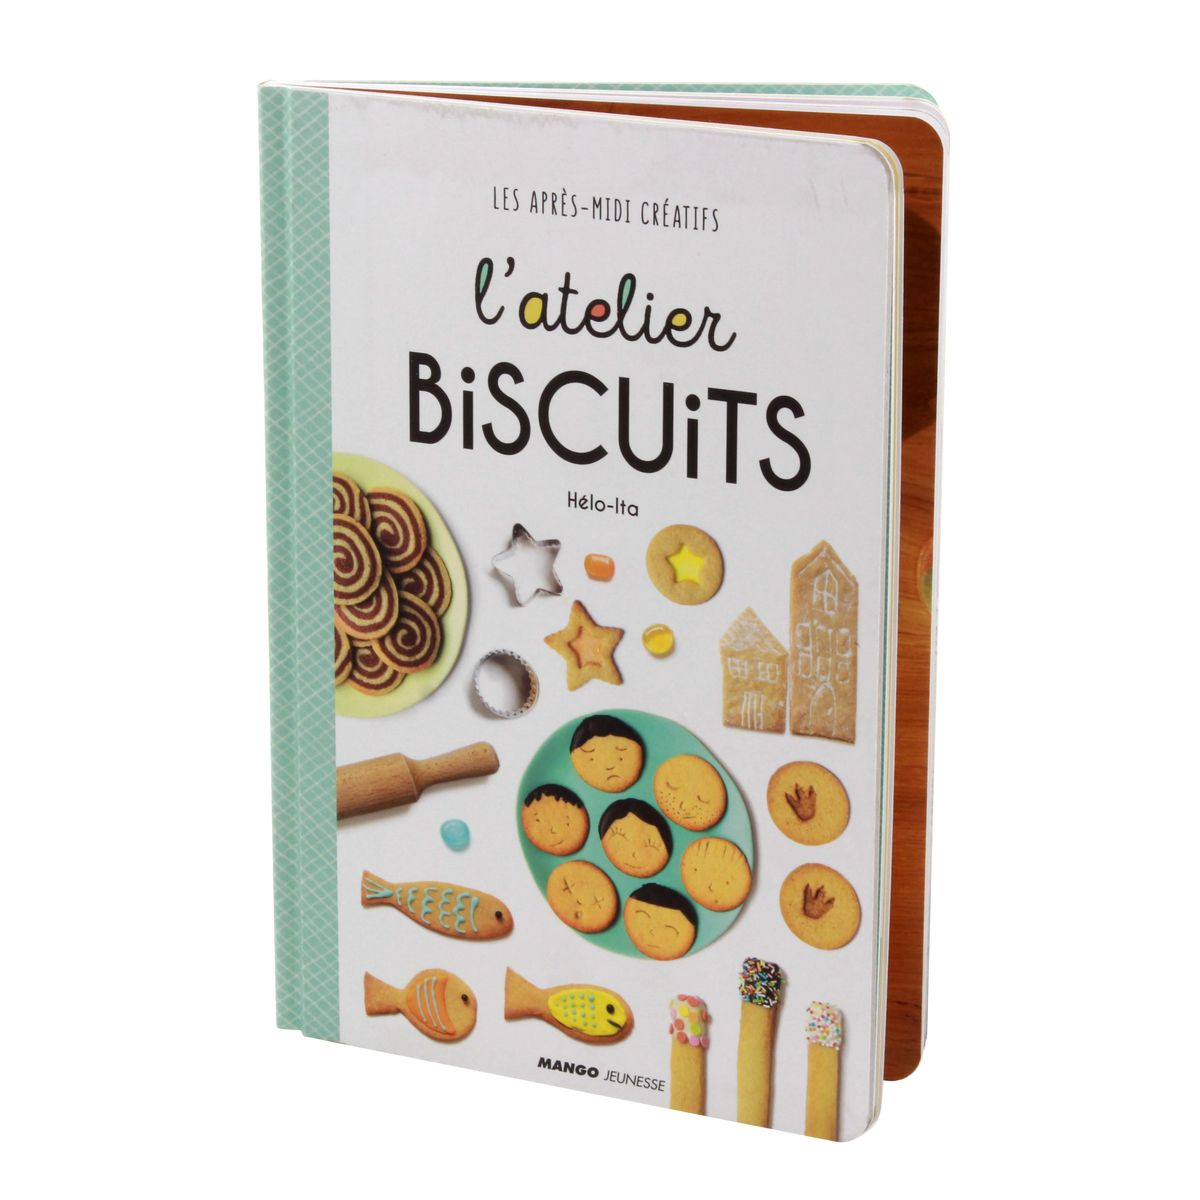 L´atelier biscuits - Mango Jeunesse